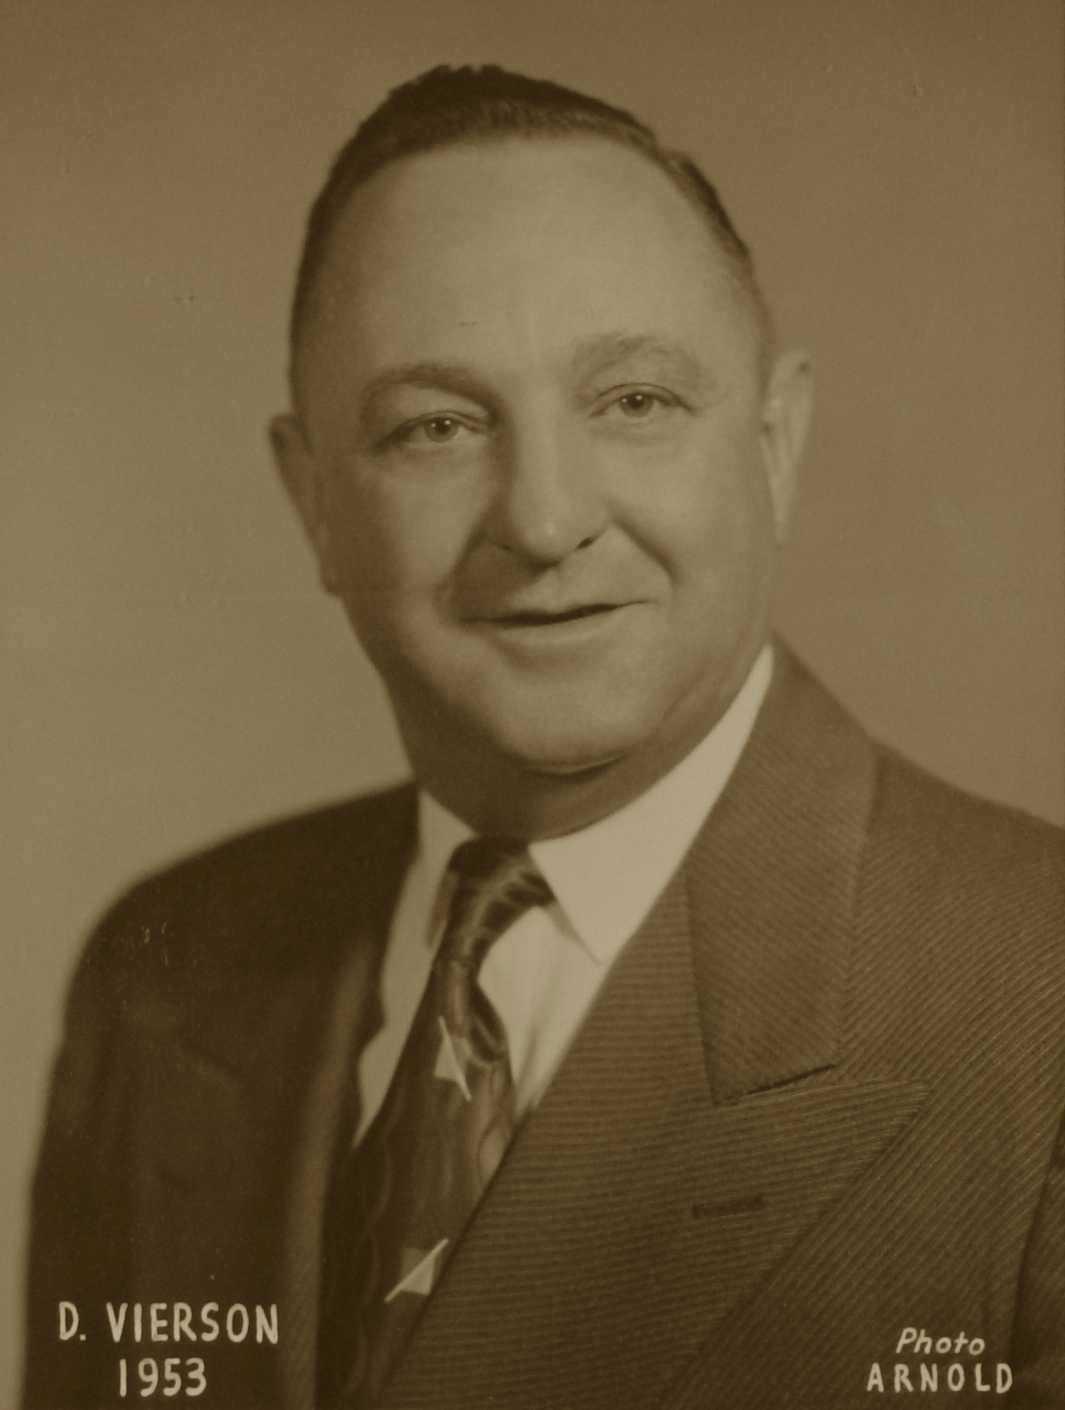 D. Vierson, 1953